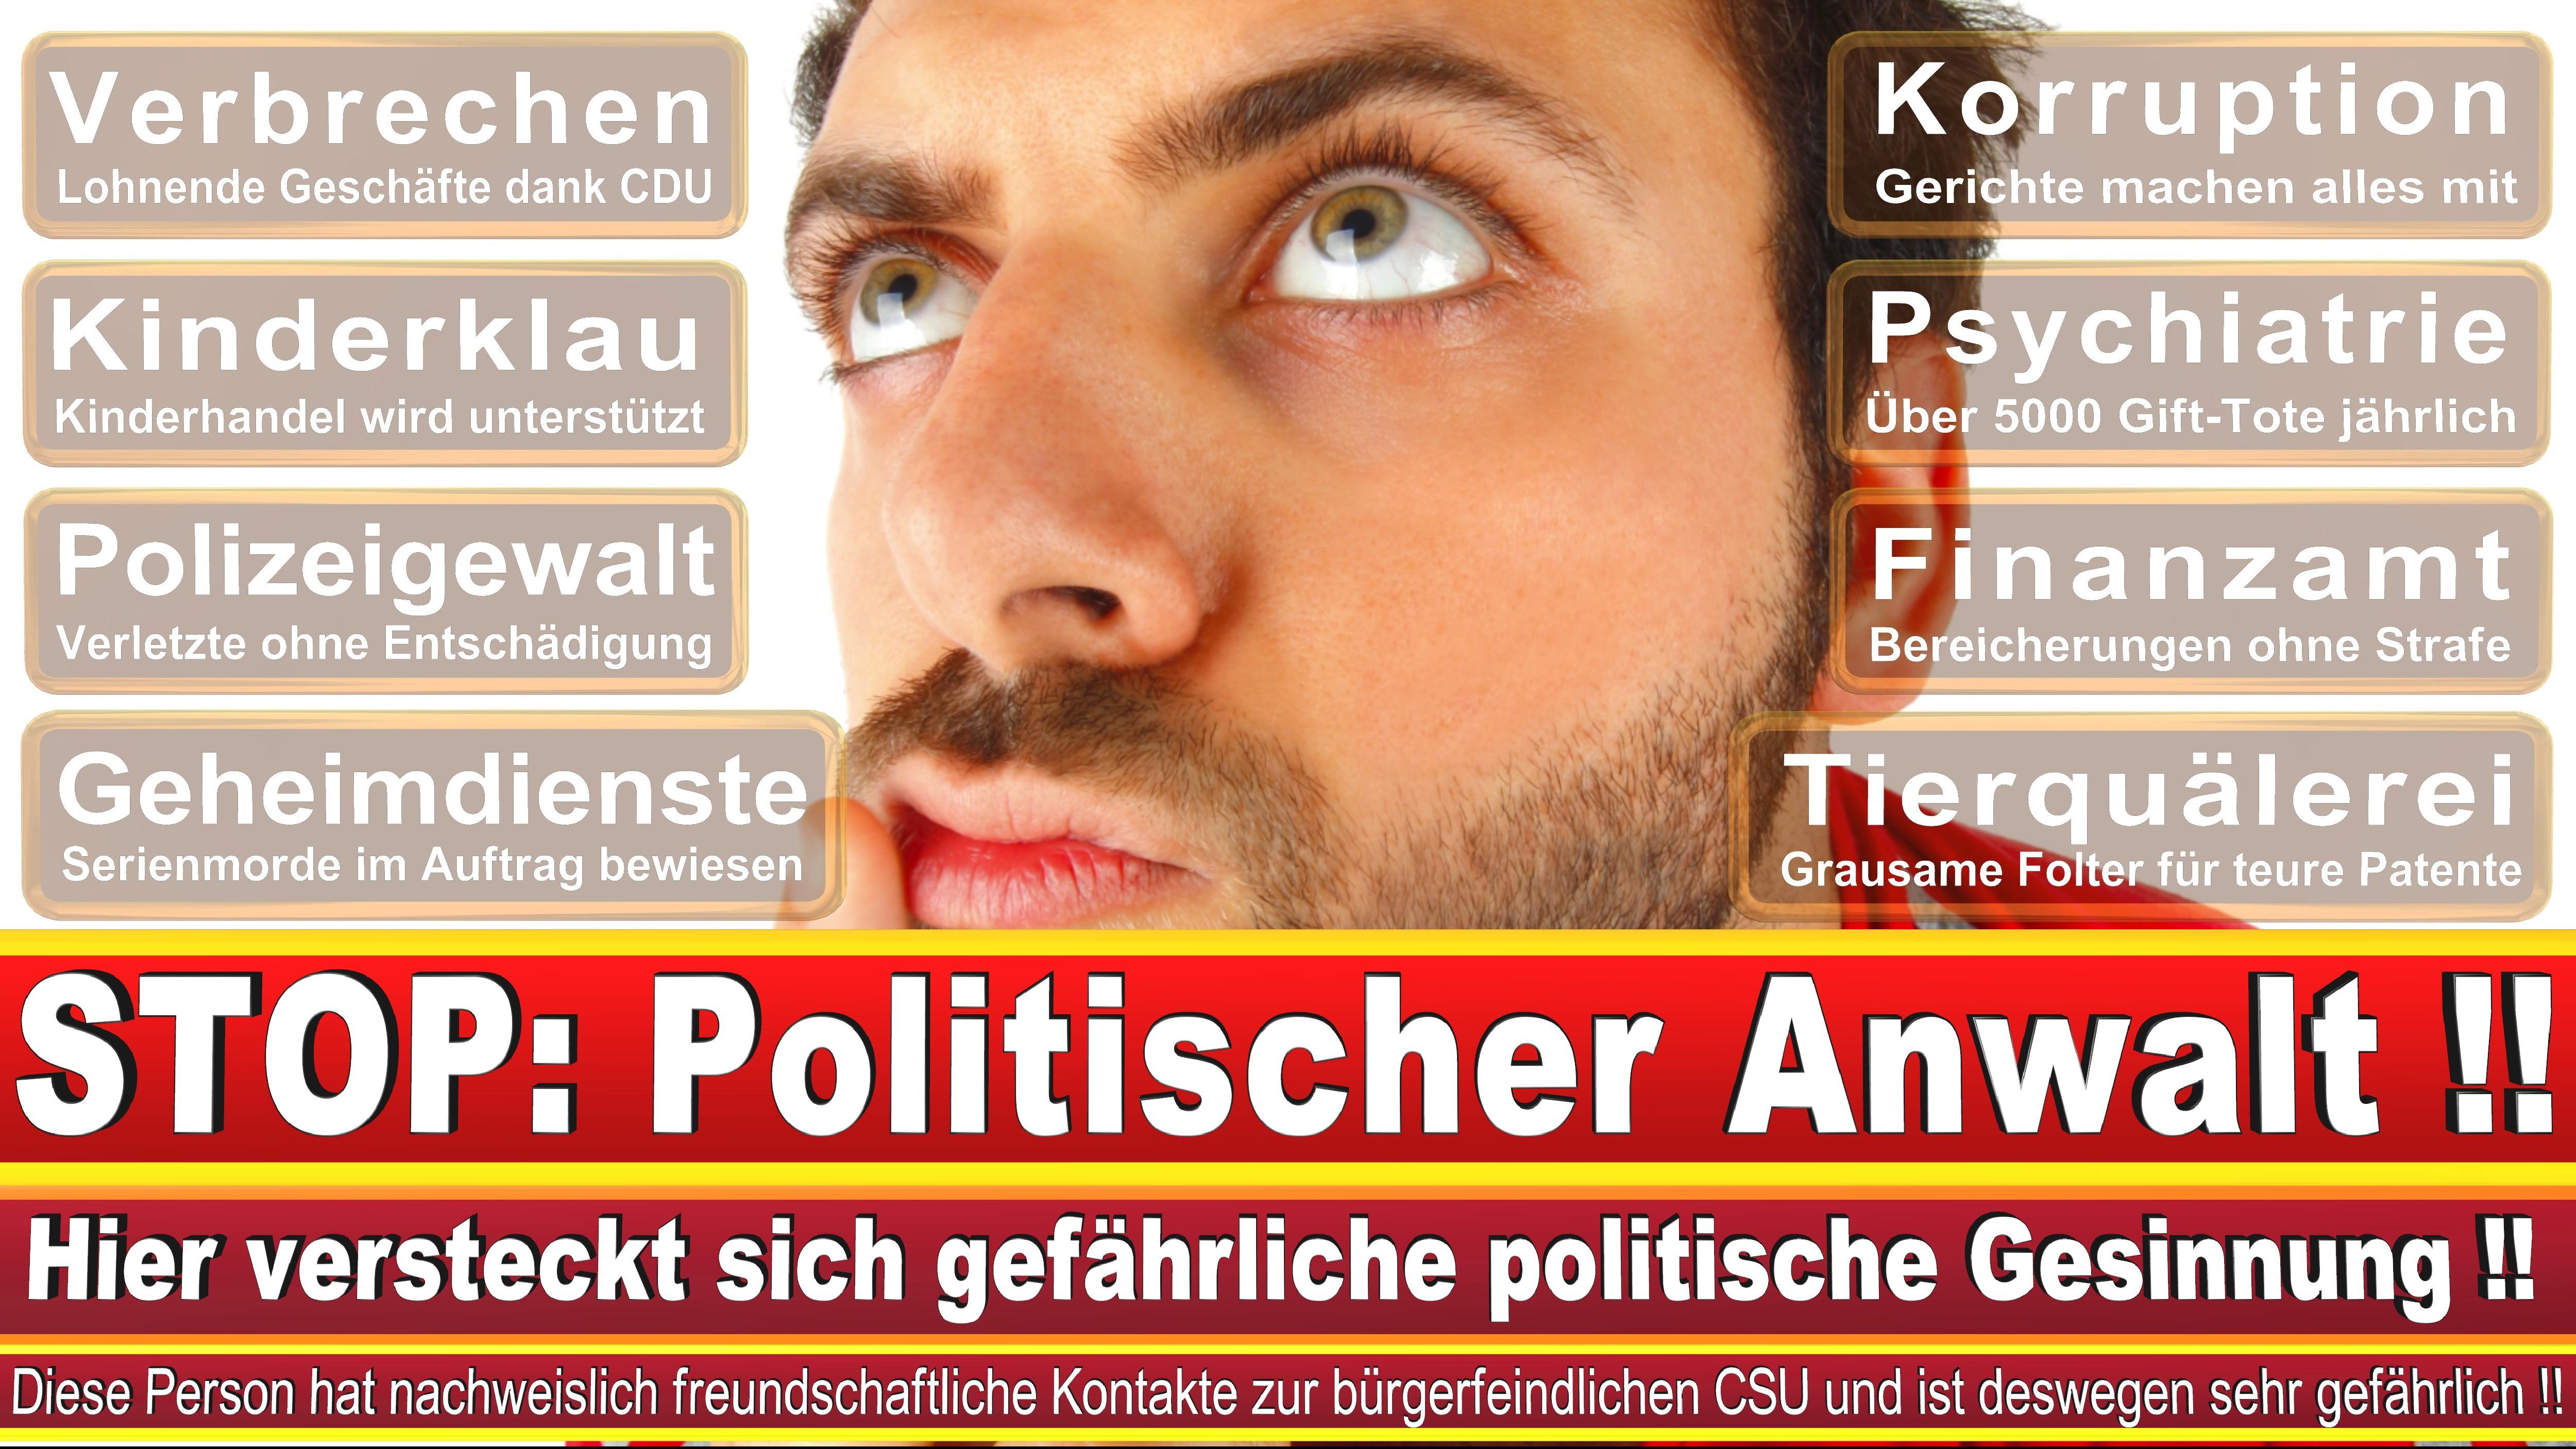 Rechtsanwalt Florian Alte Anzing Selbstständig Rechtsanwalt Fachanwalt Für Strafrecht Rechtsanwalt Florian C T Alte